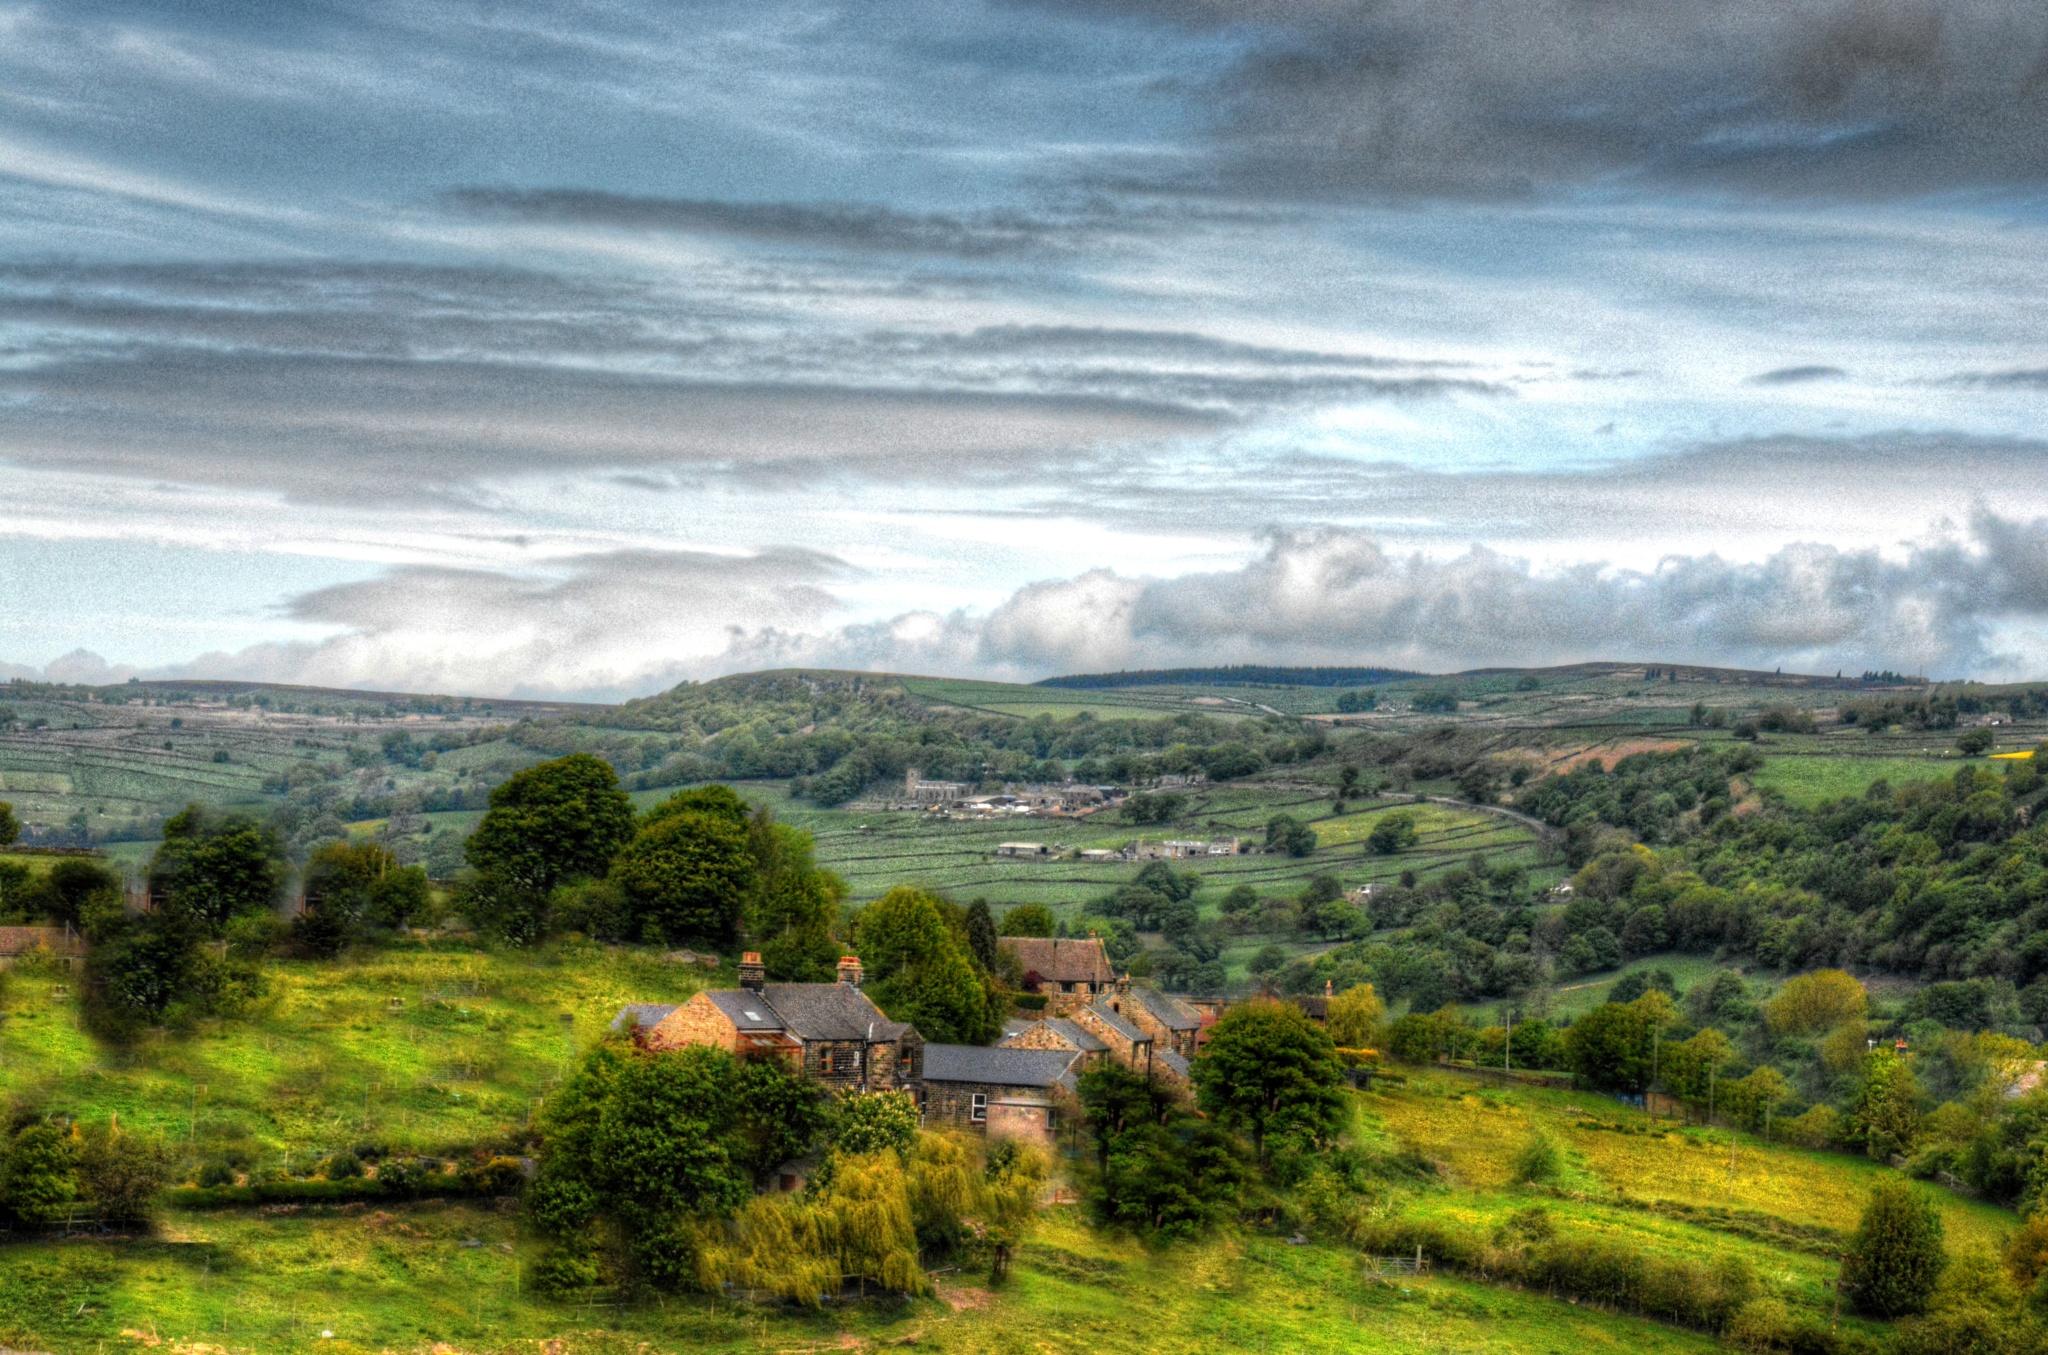 countryside view near bradfield yorkshire by Stuart Robertshaw Photography